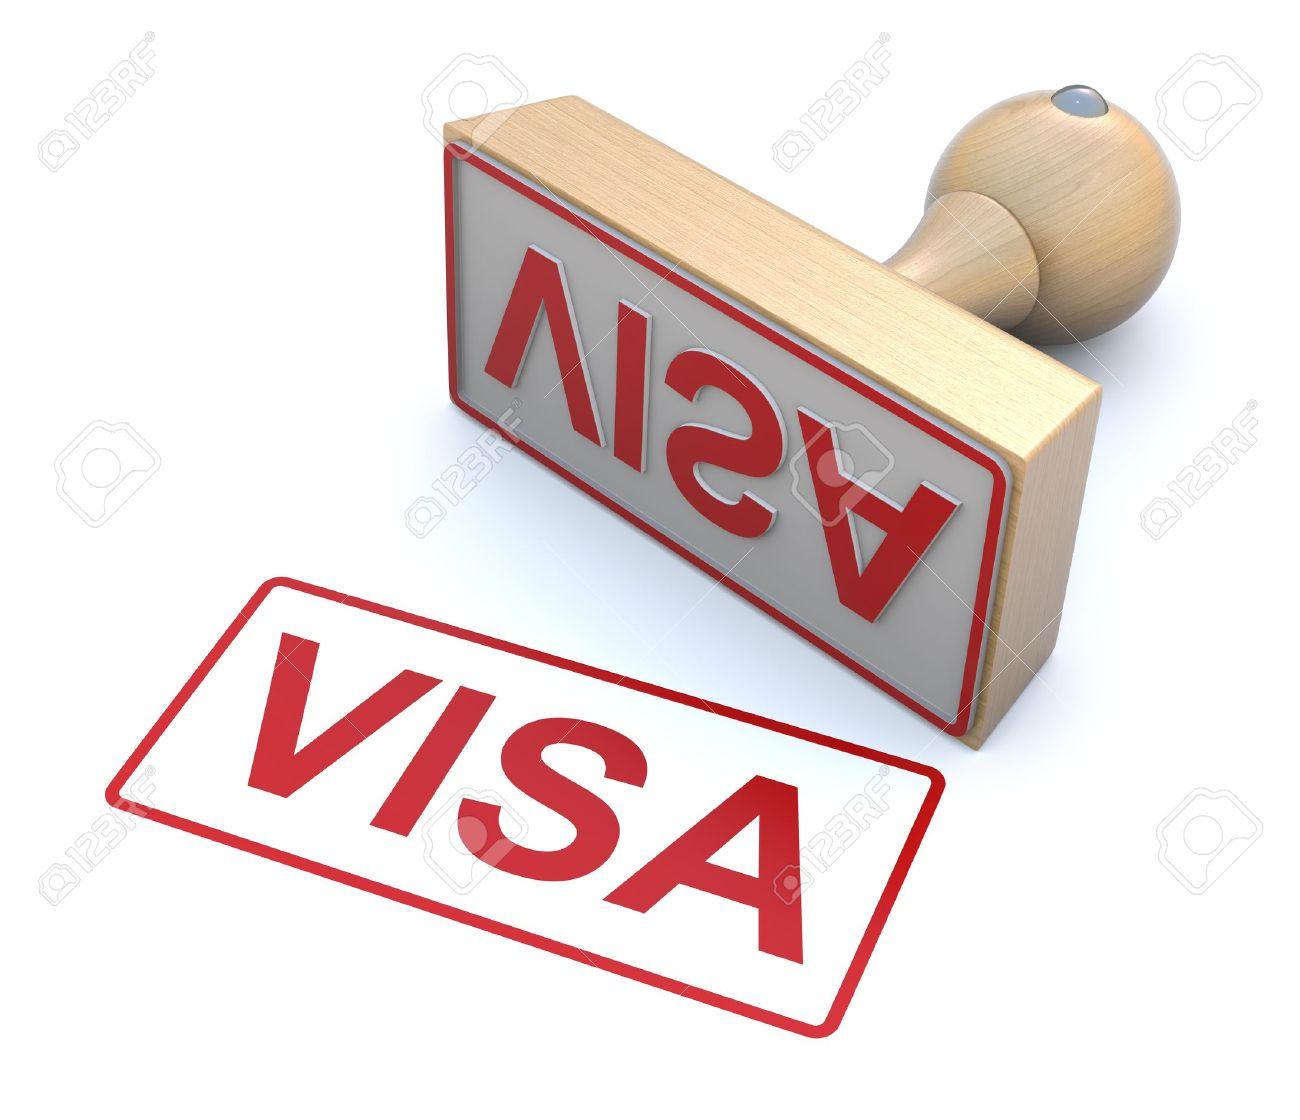 Visas Clipart.